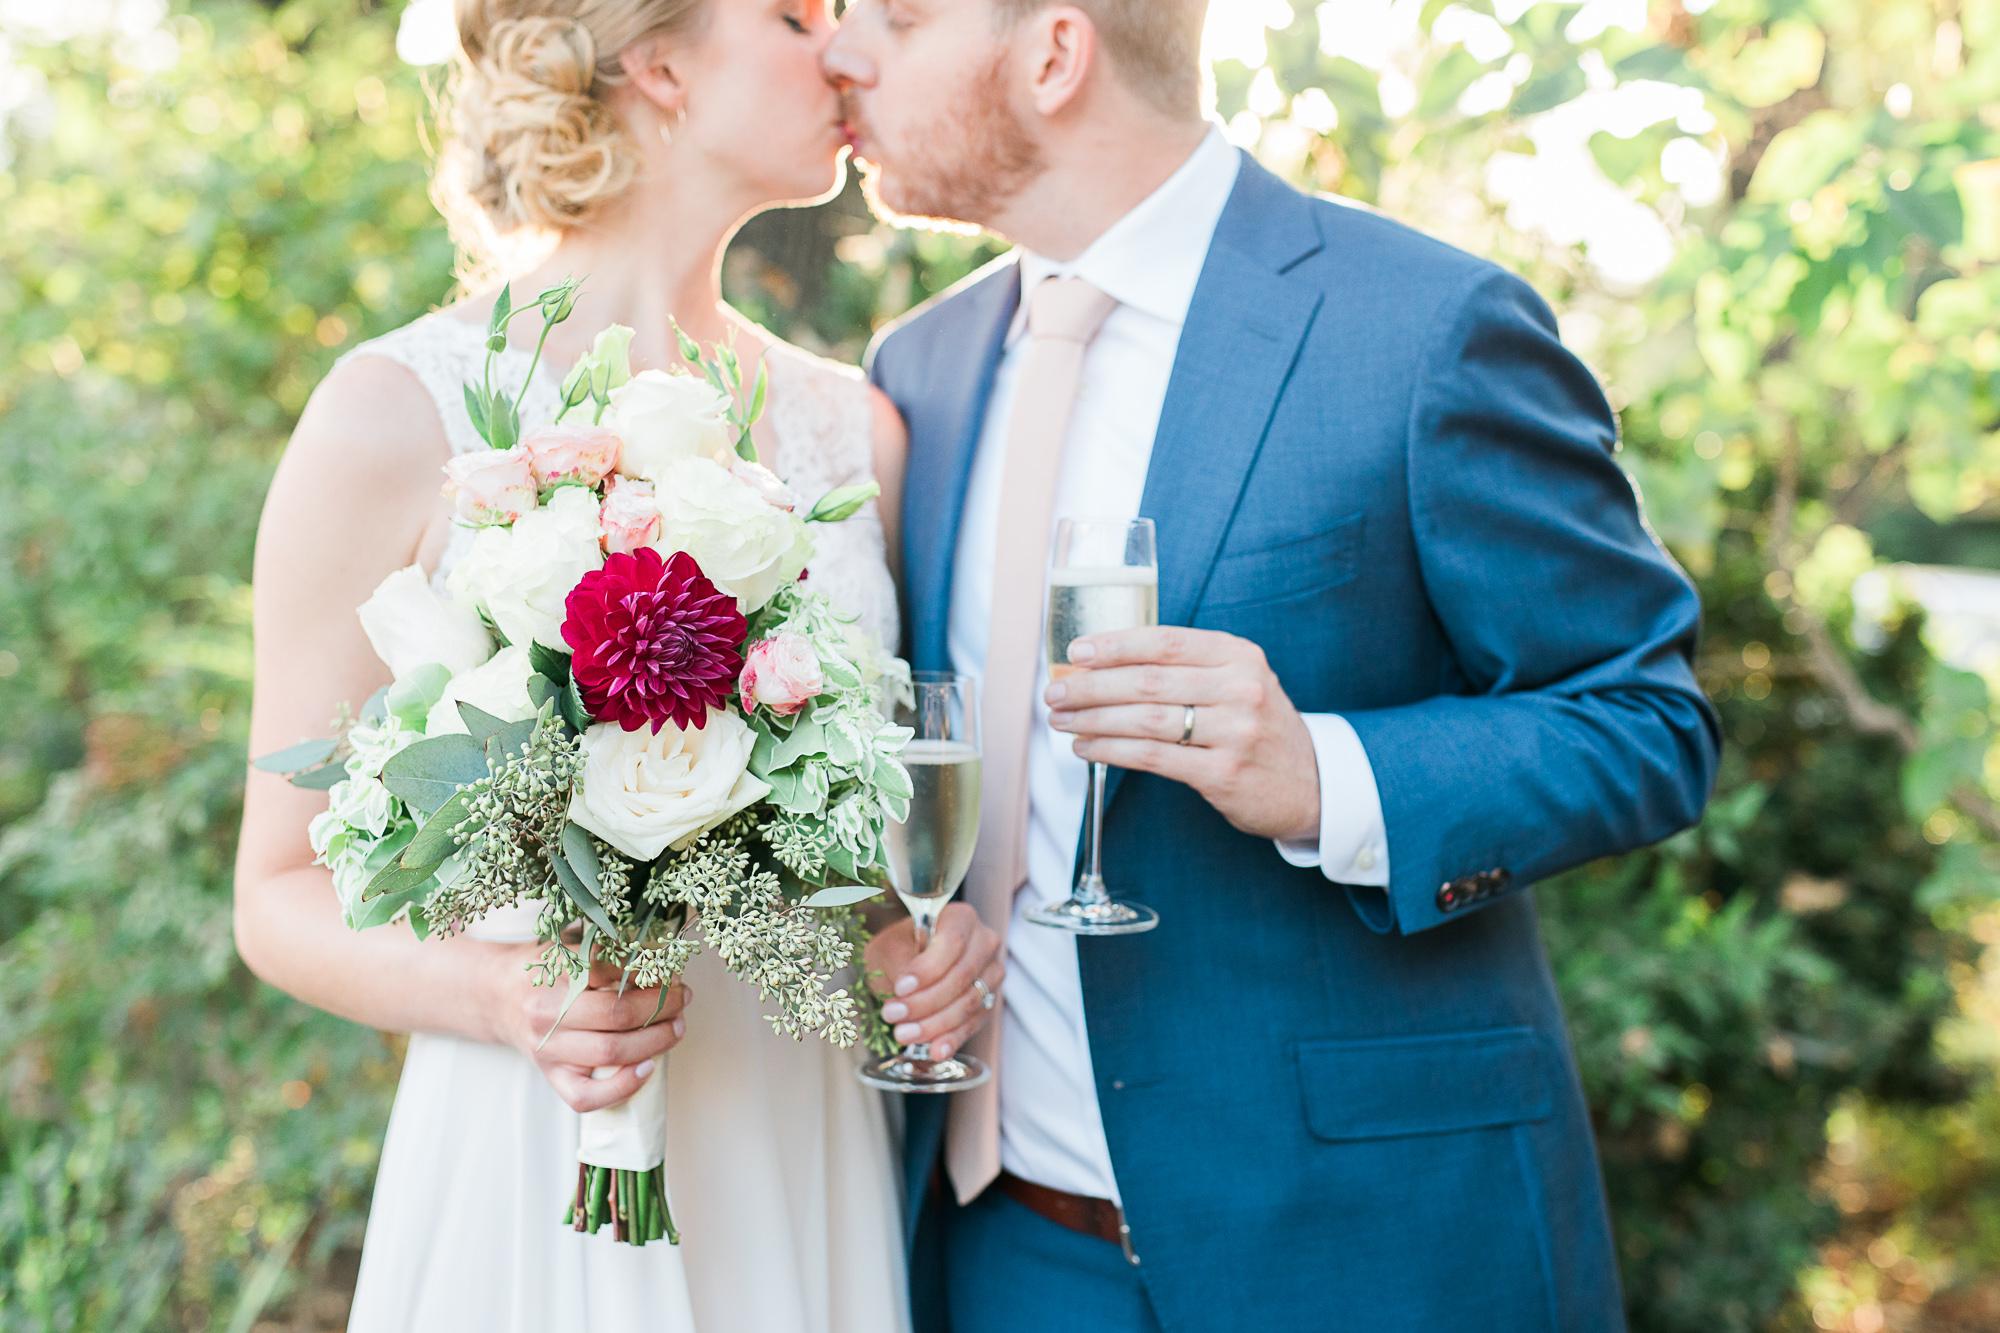 Generals Daughter Wedding Photos by JBJ Pictures - Ramekins Wedding Venue Photographer in Sonoma, Napa (30).jpg